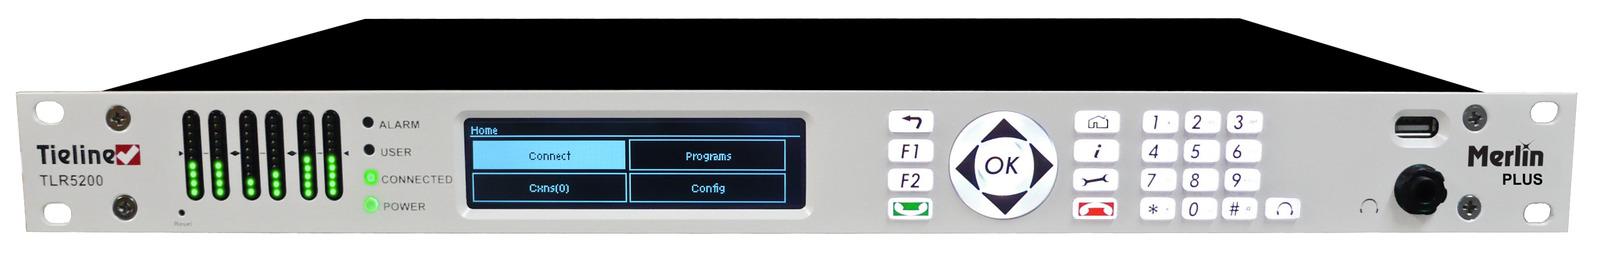 TIeline TLR5200MP - Merlin PLUS